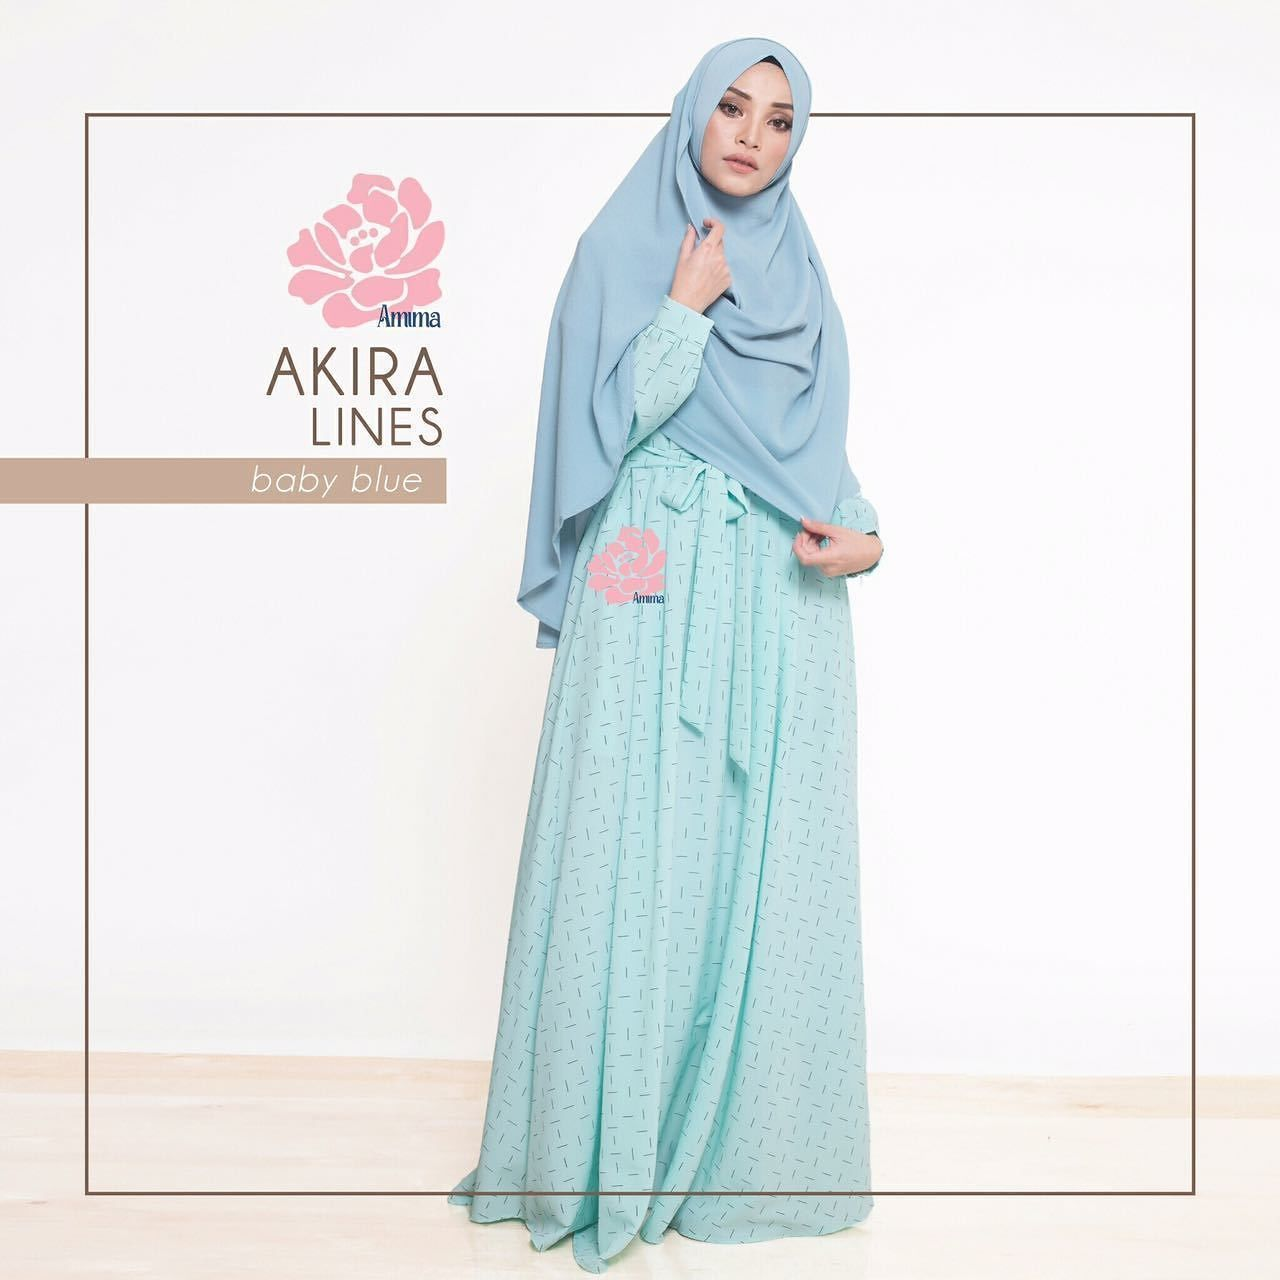 Gamis Amima Akira Dress Lines Baby Blue - baju muslim wanita baju muslimah  Untukmu yg cantik 43607924a7